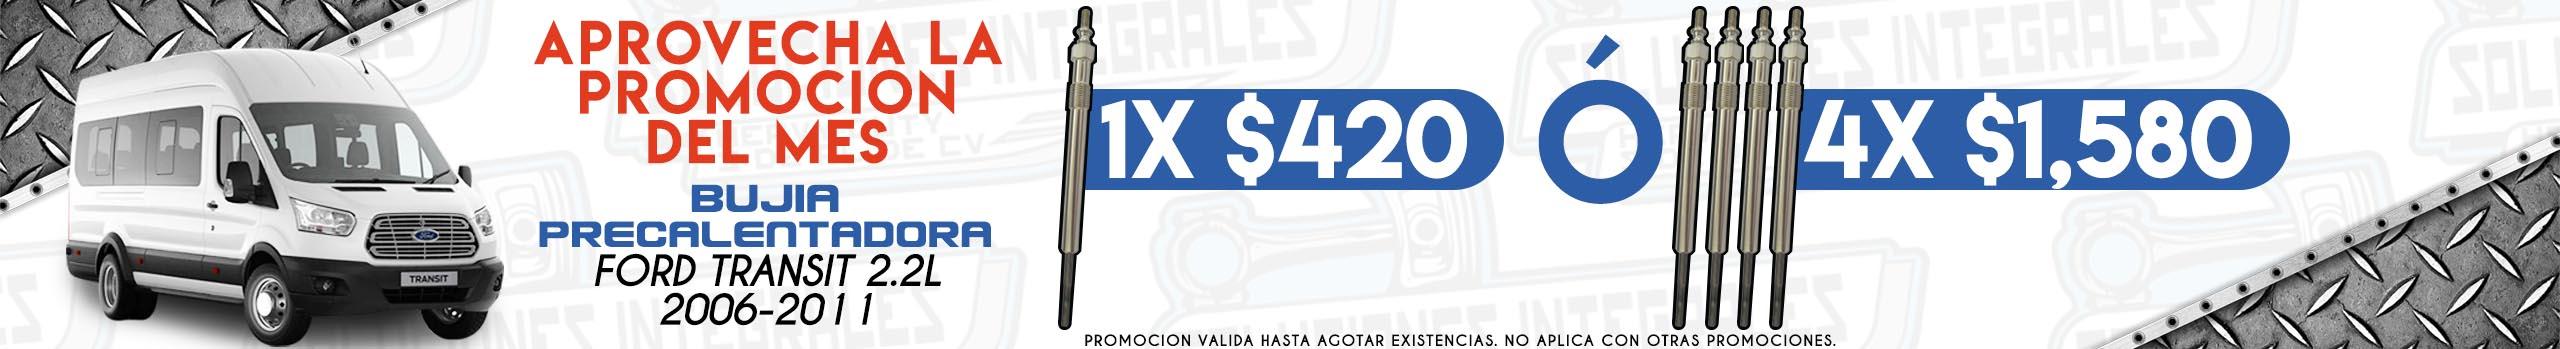 promocion bujia ford transit 2006-2011